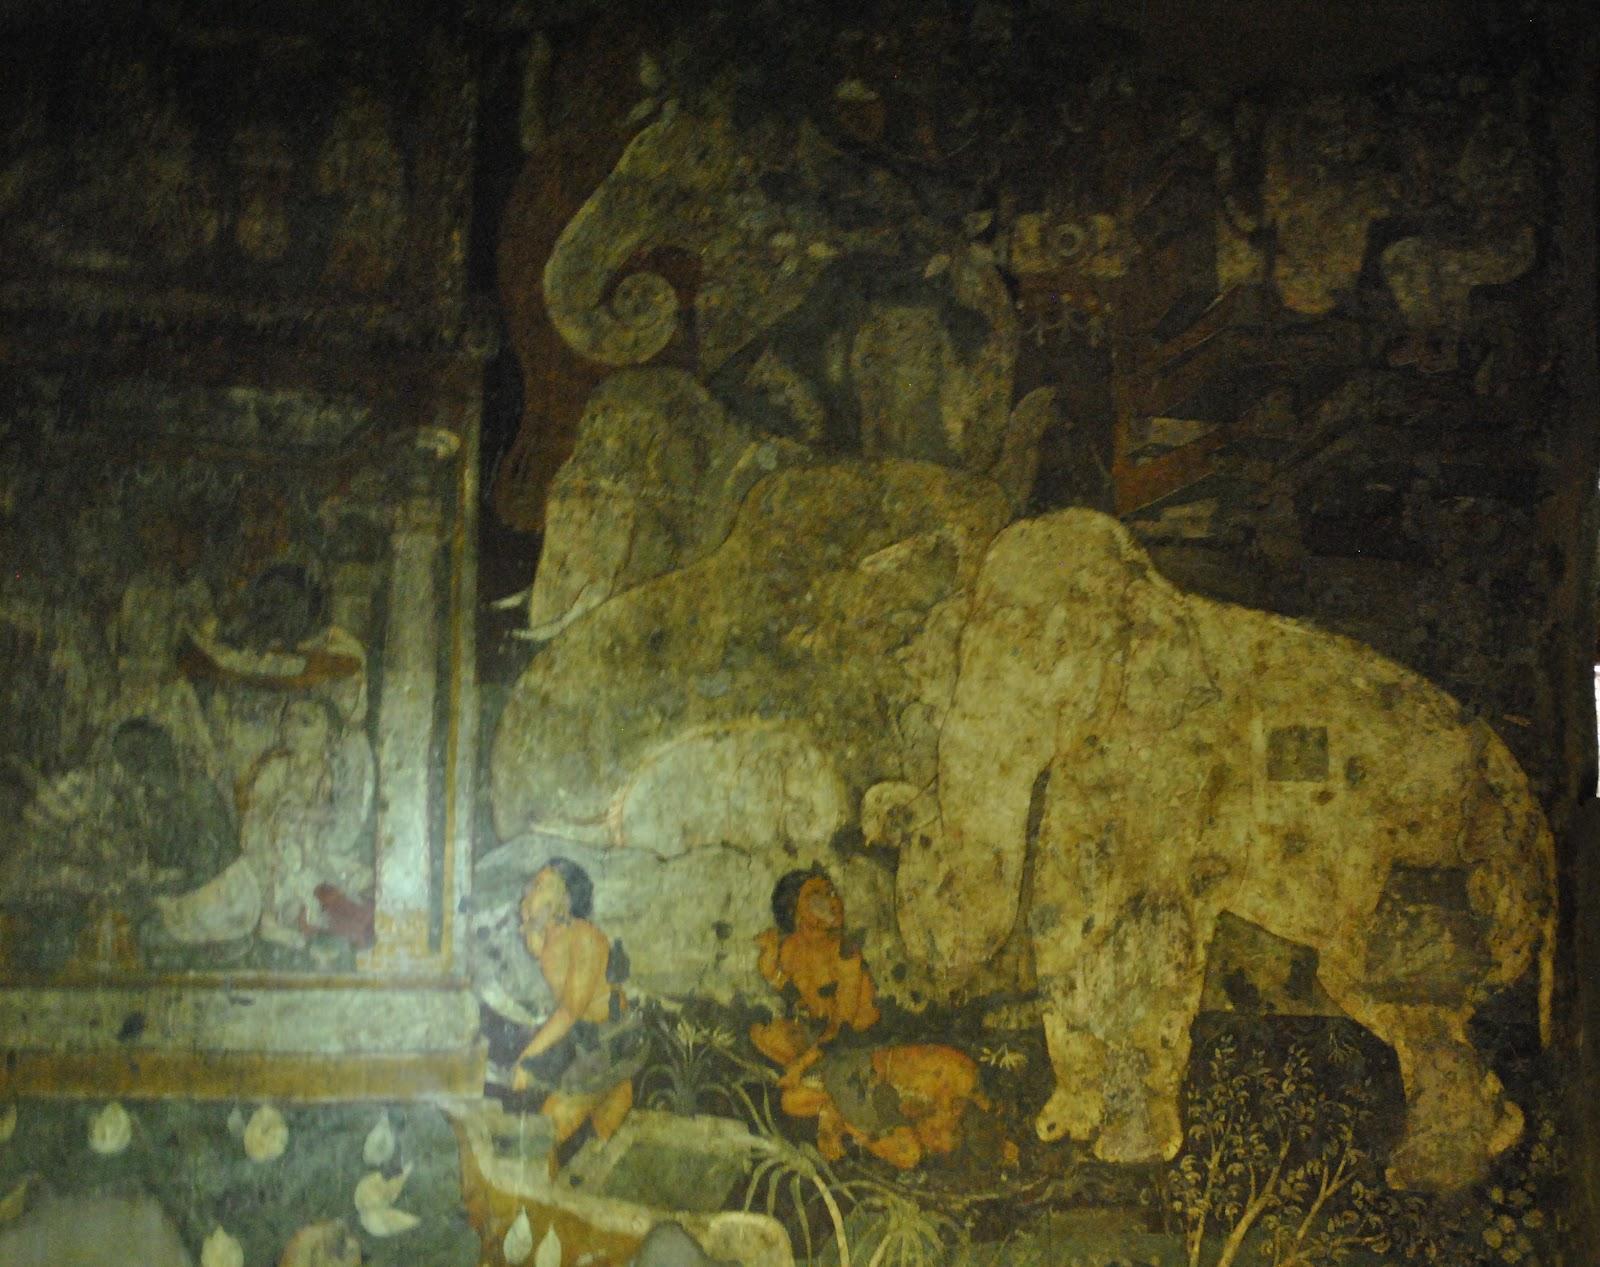 Image result for cave 17 matriposhaka jataka